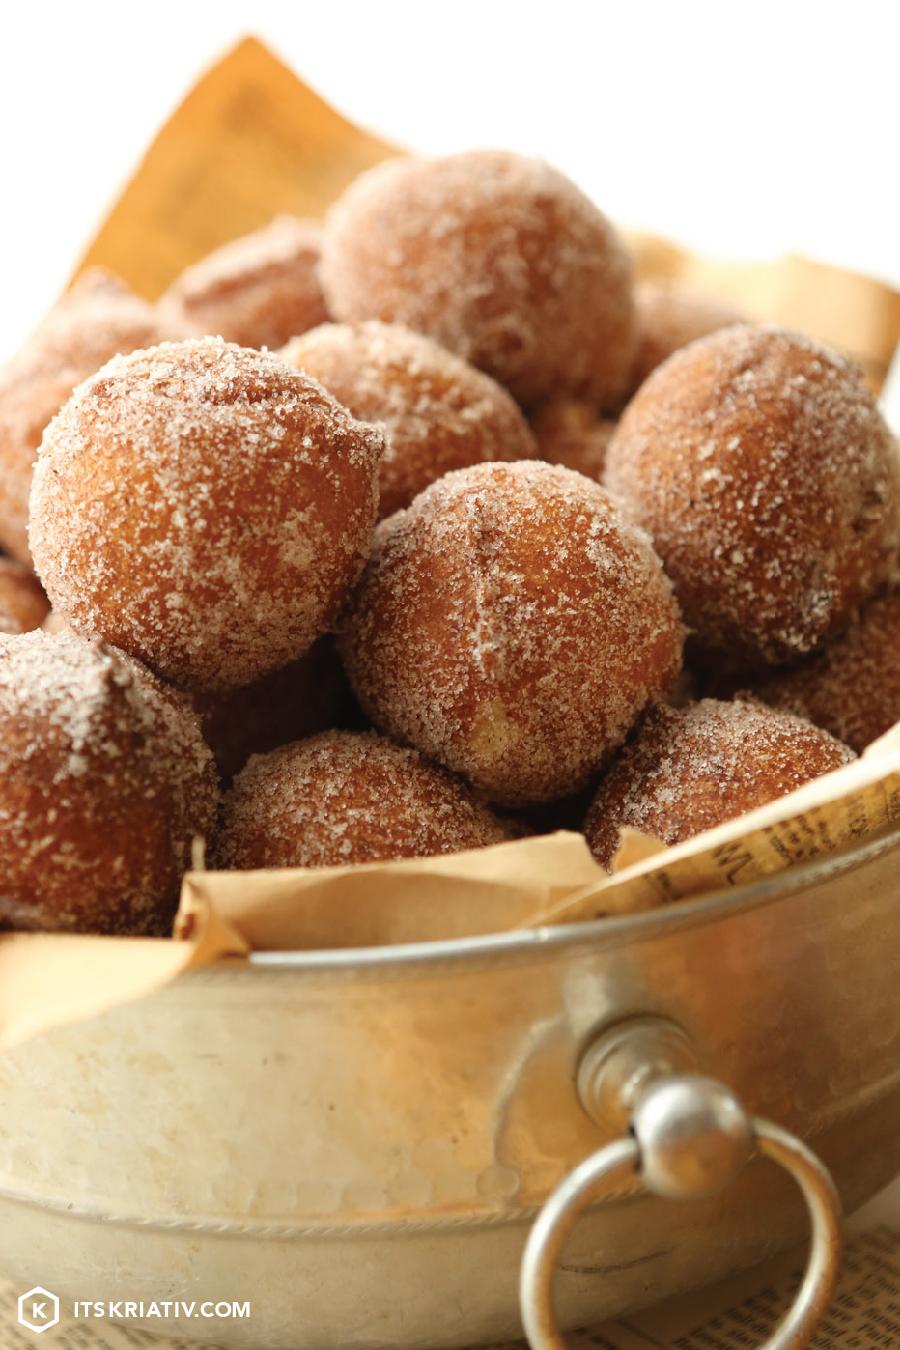 ItsKriativ_Food_Zeppole_Cinnamon_Sugar-07.jpg